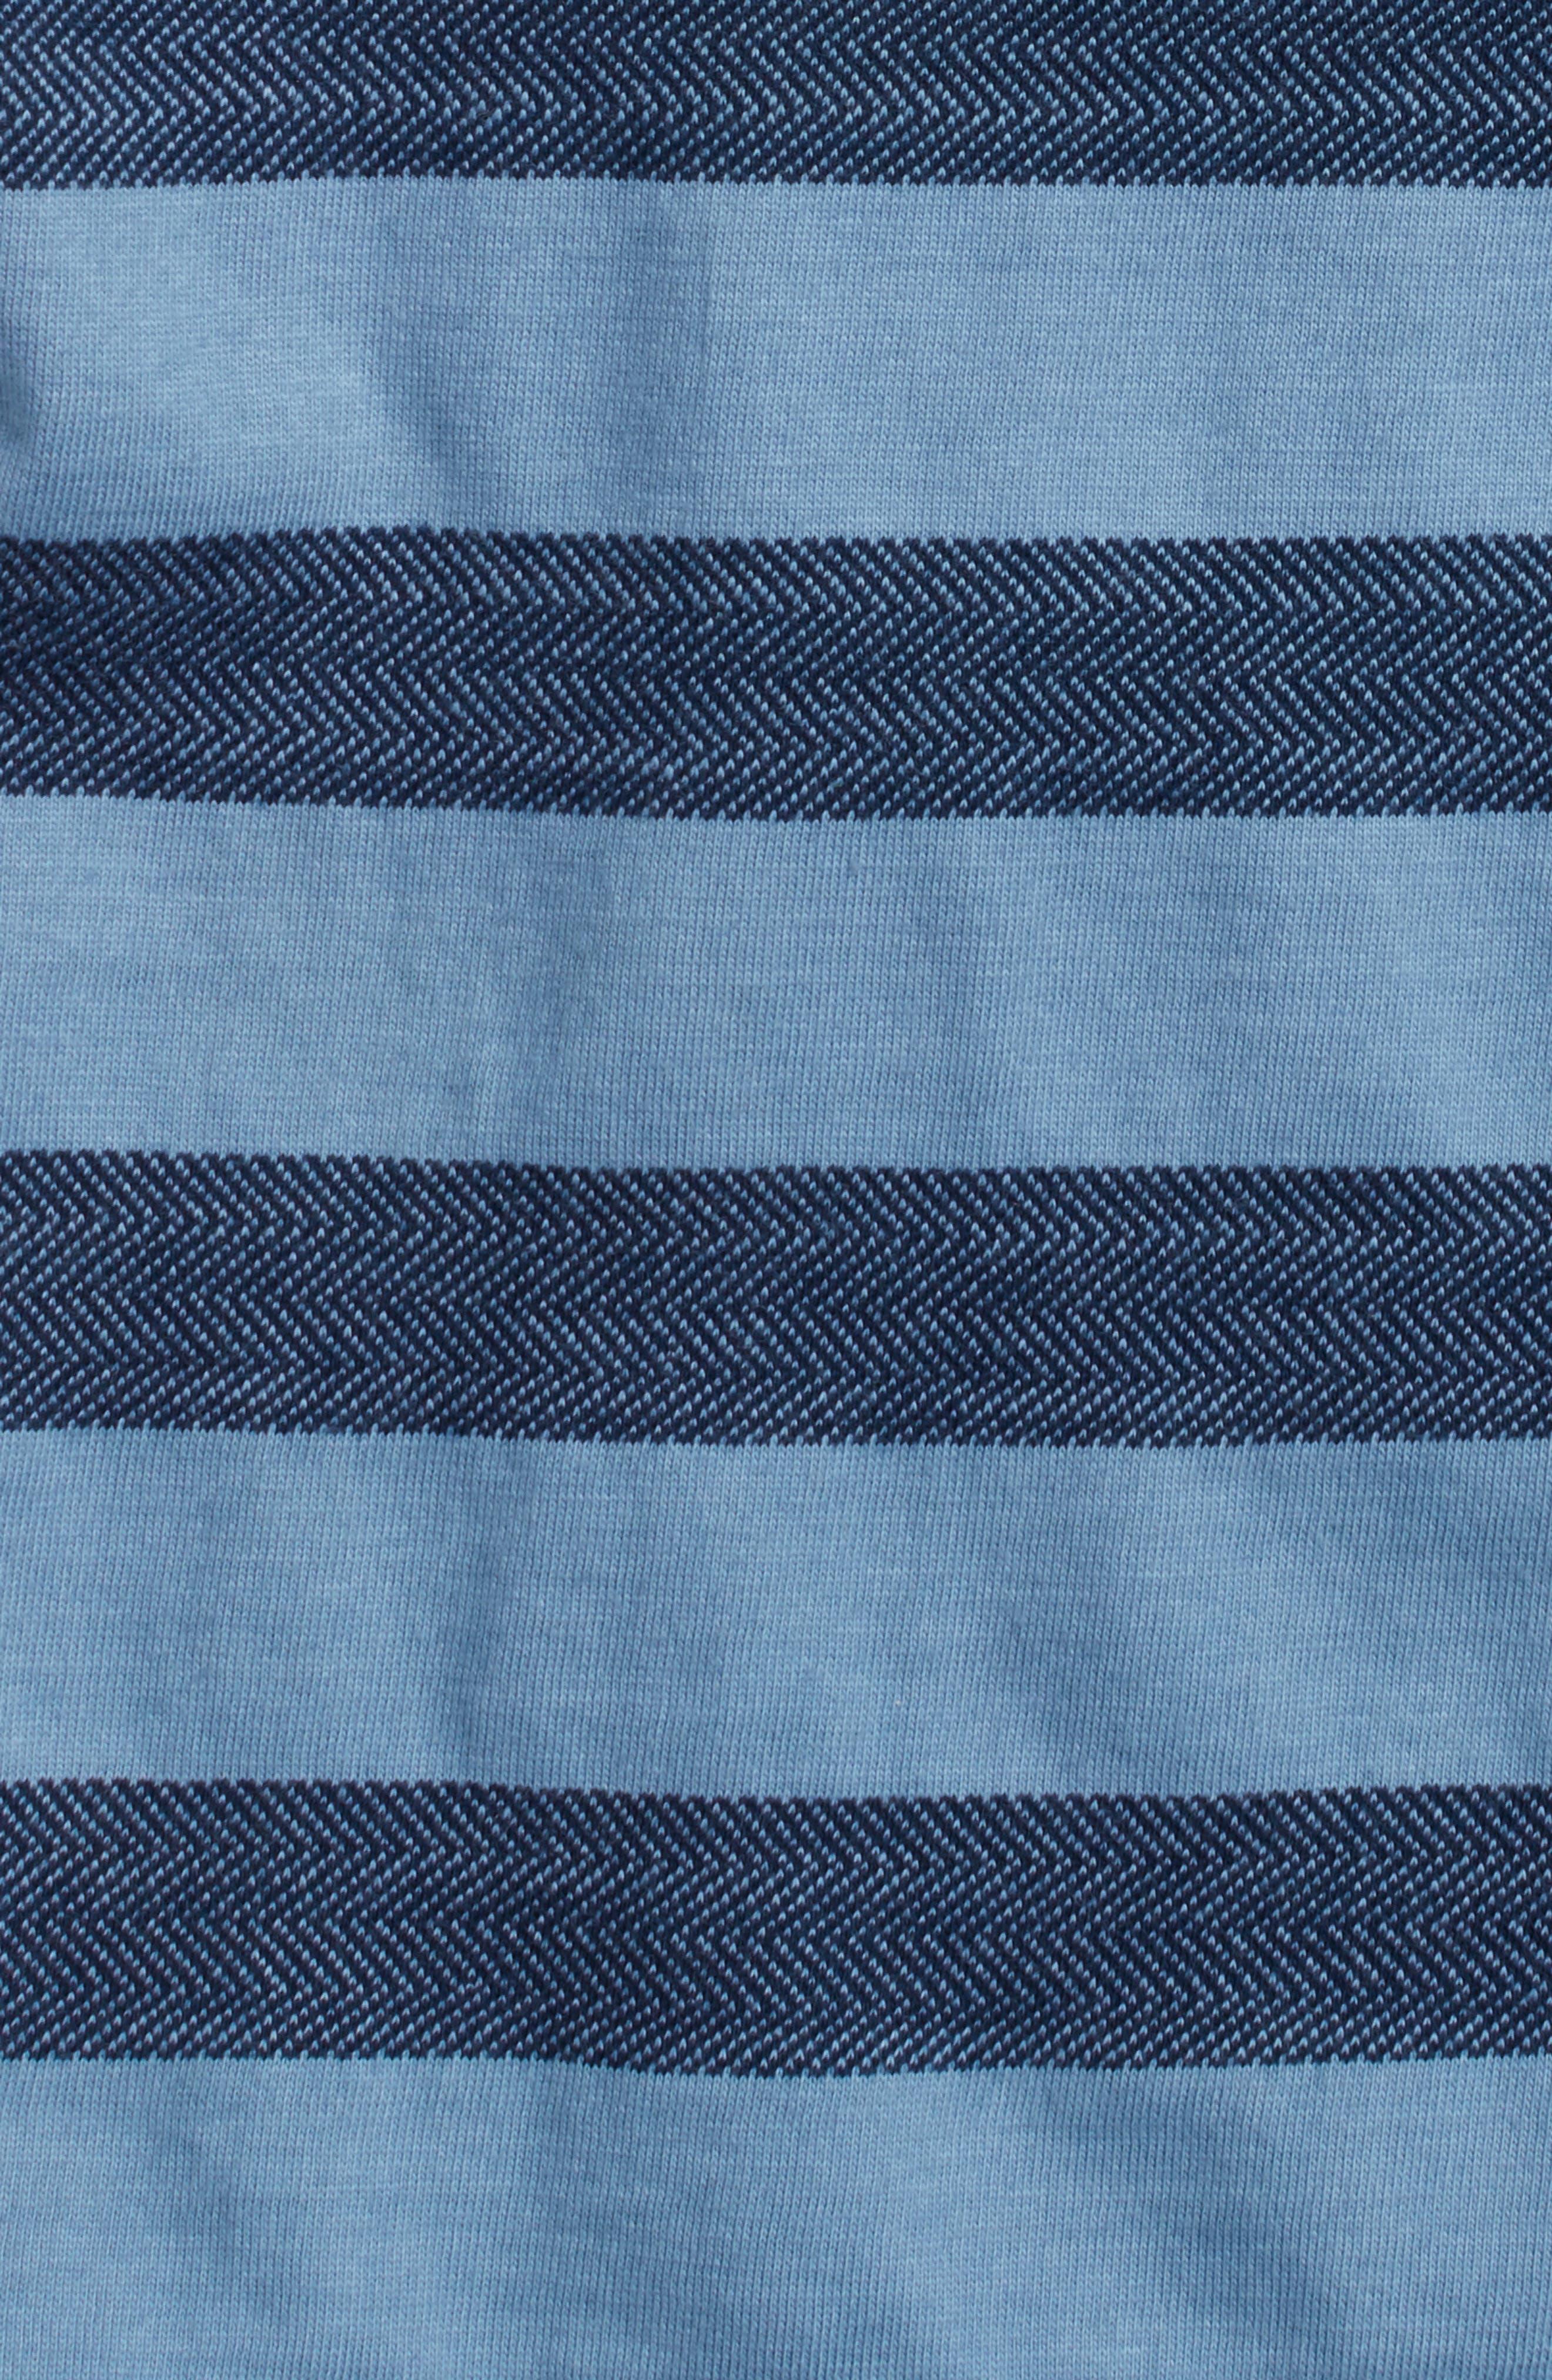 Alternate Image 2  - Tucker + Tate Thomas Stripe T-Shirt (Baby Boys)